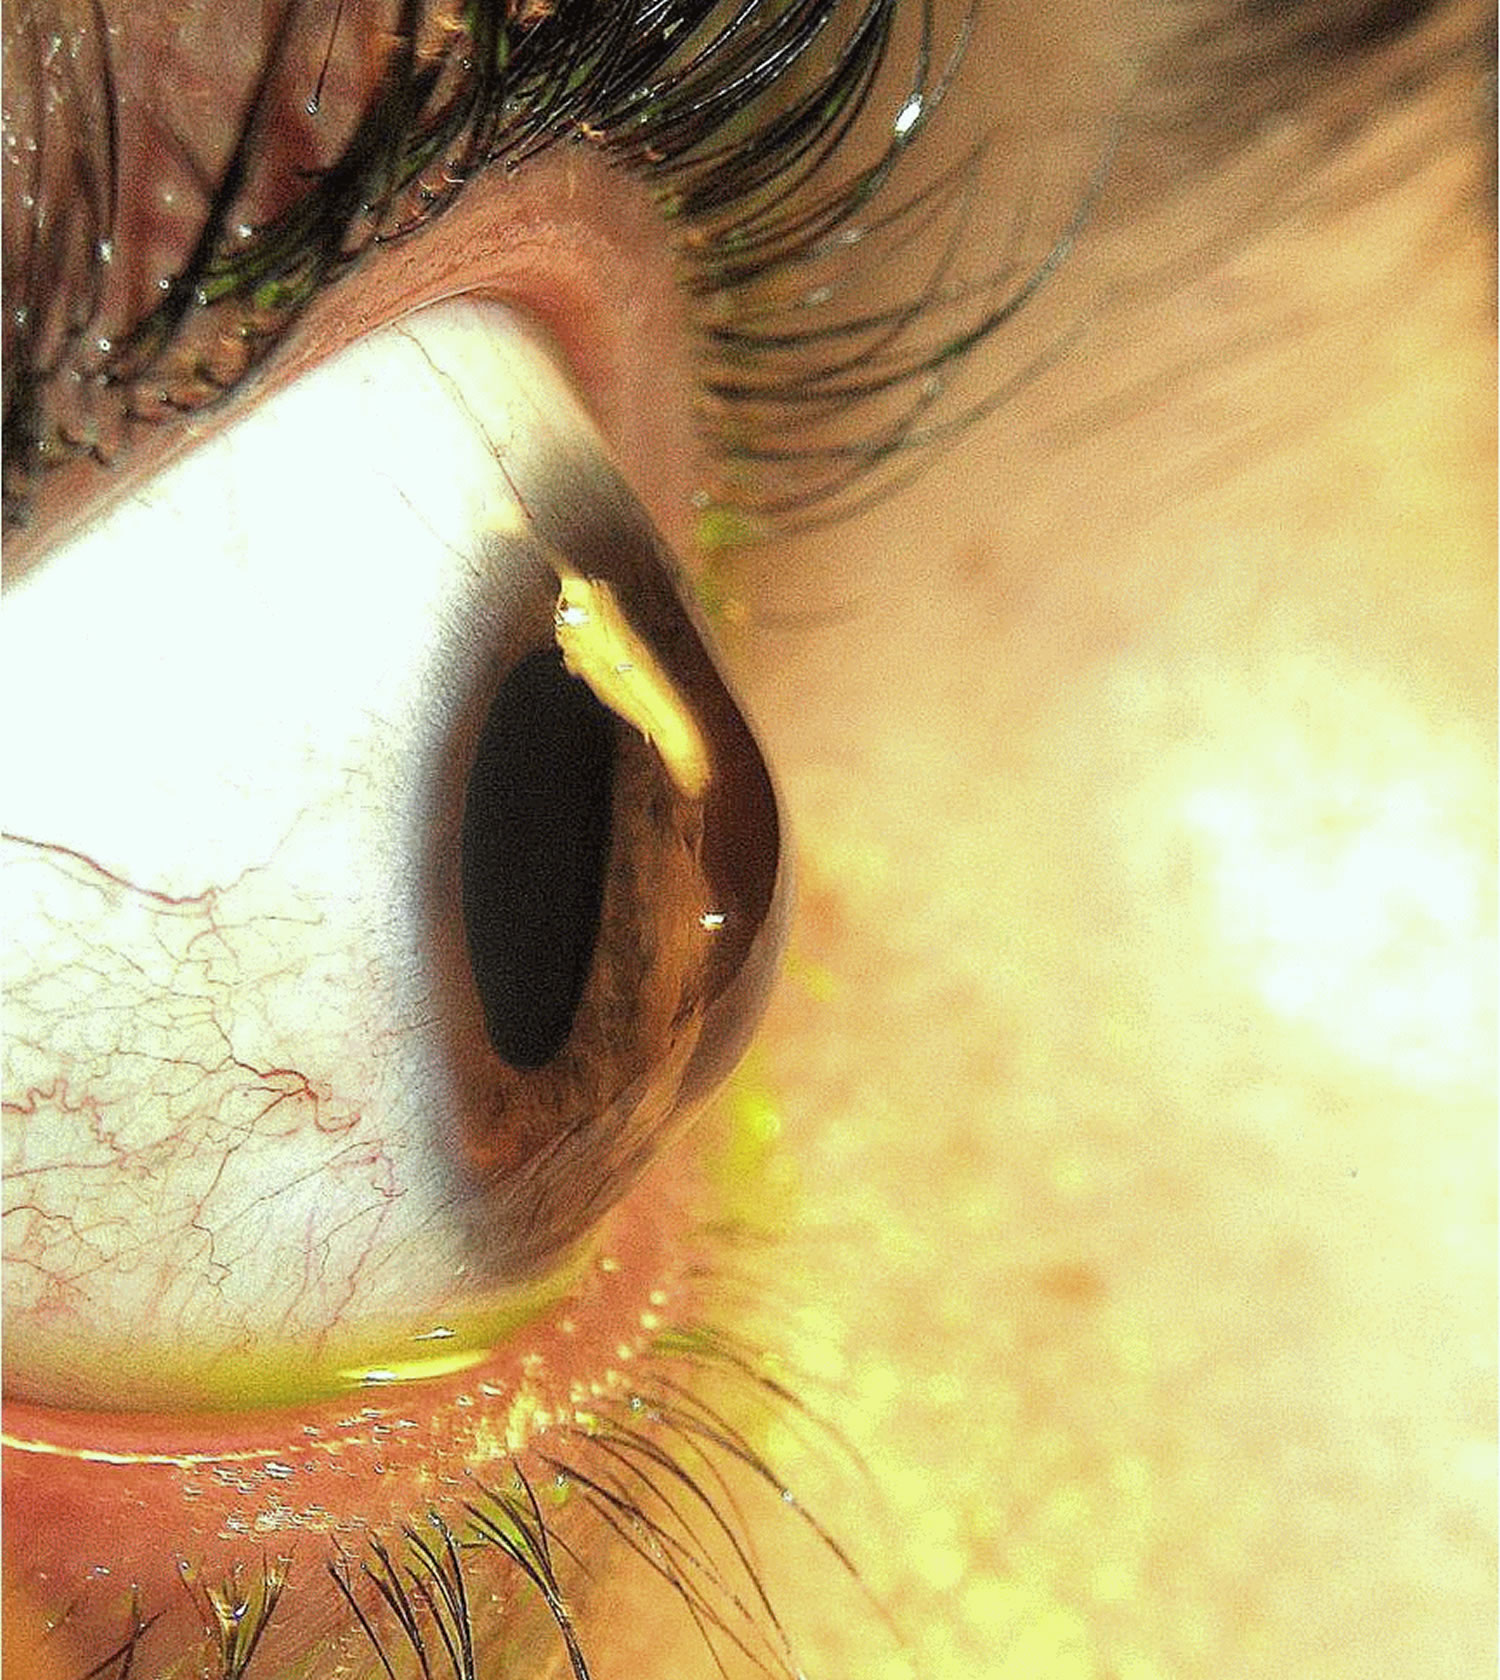 Corneal Hydrops Keratoconus - Causes, ...